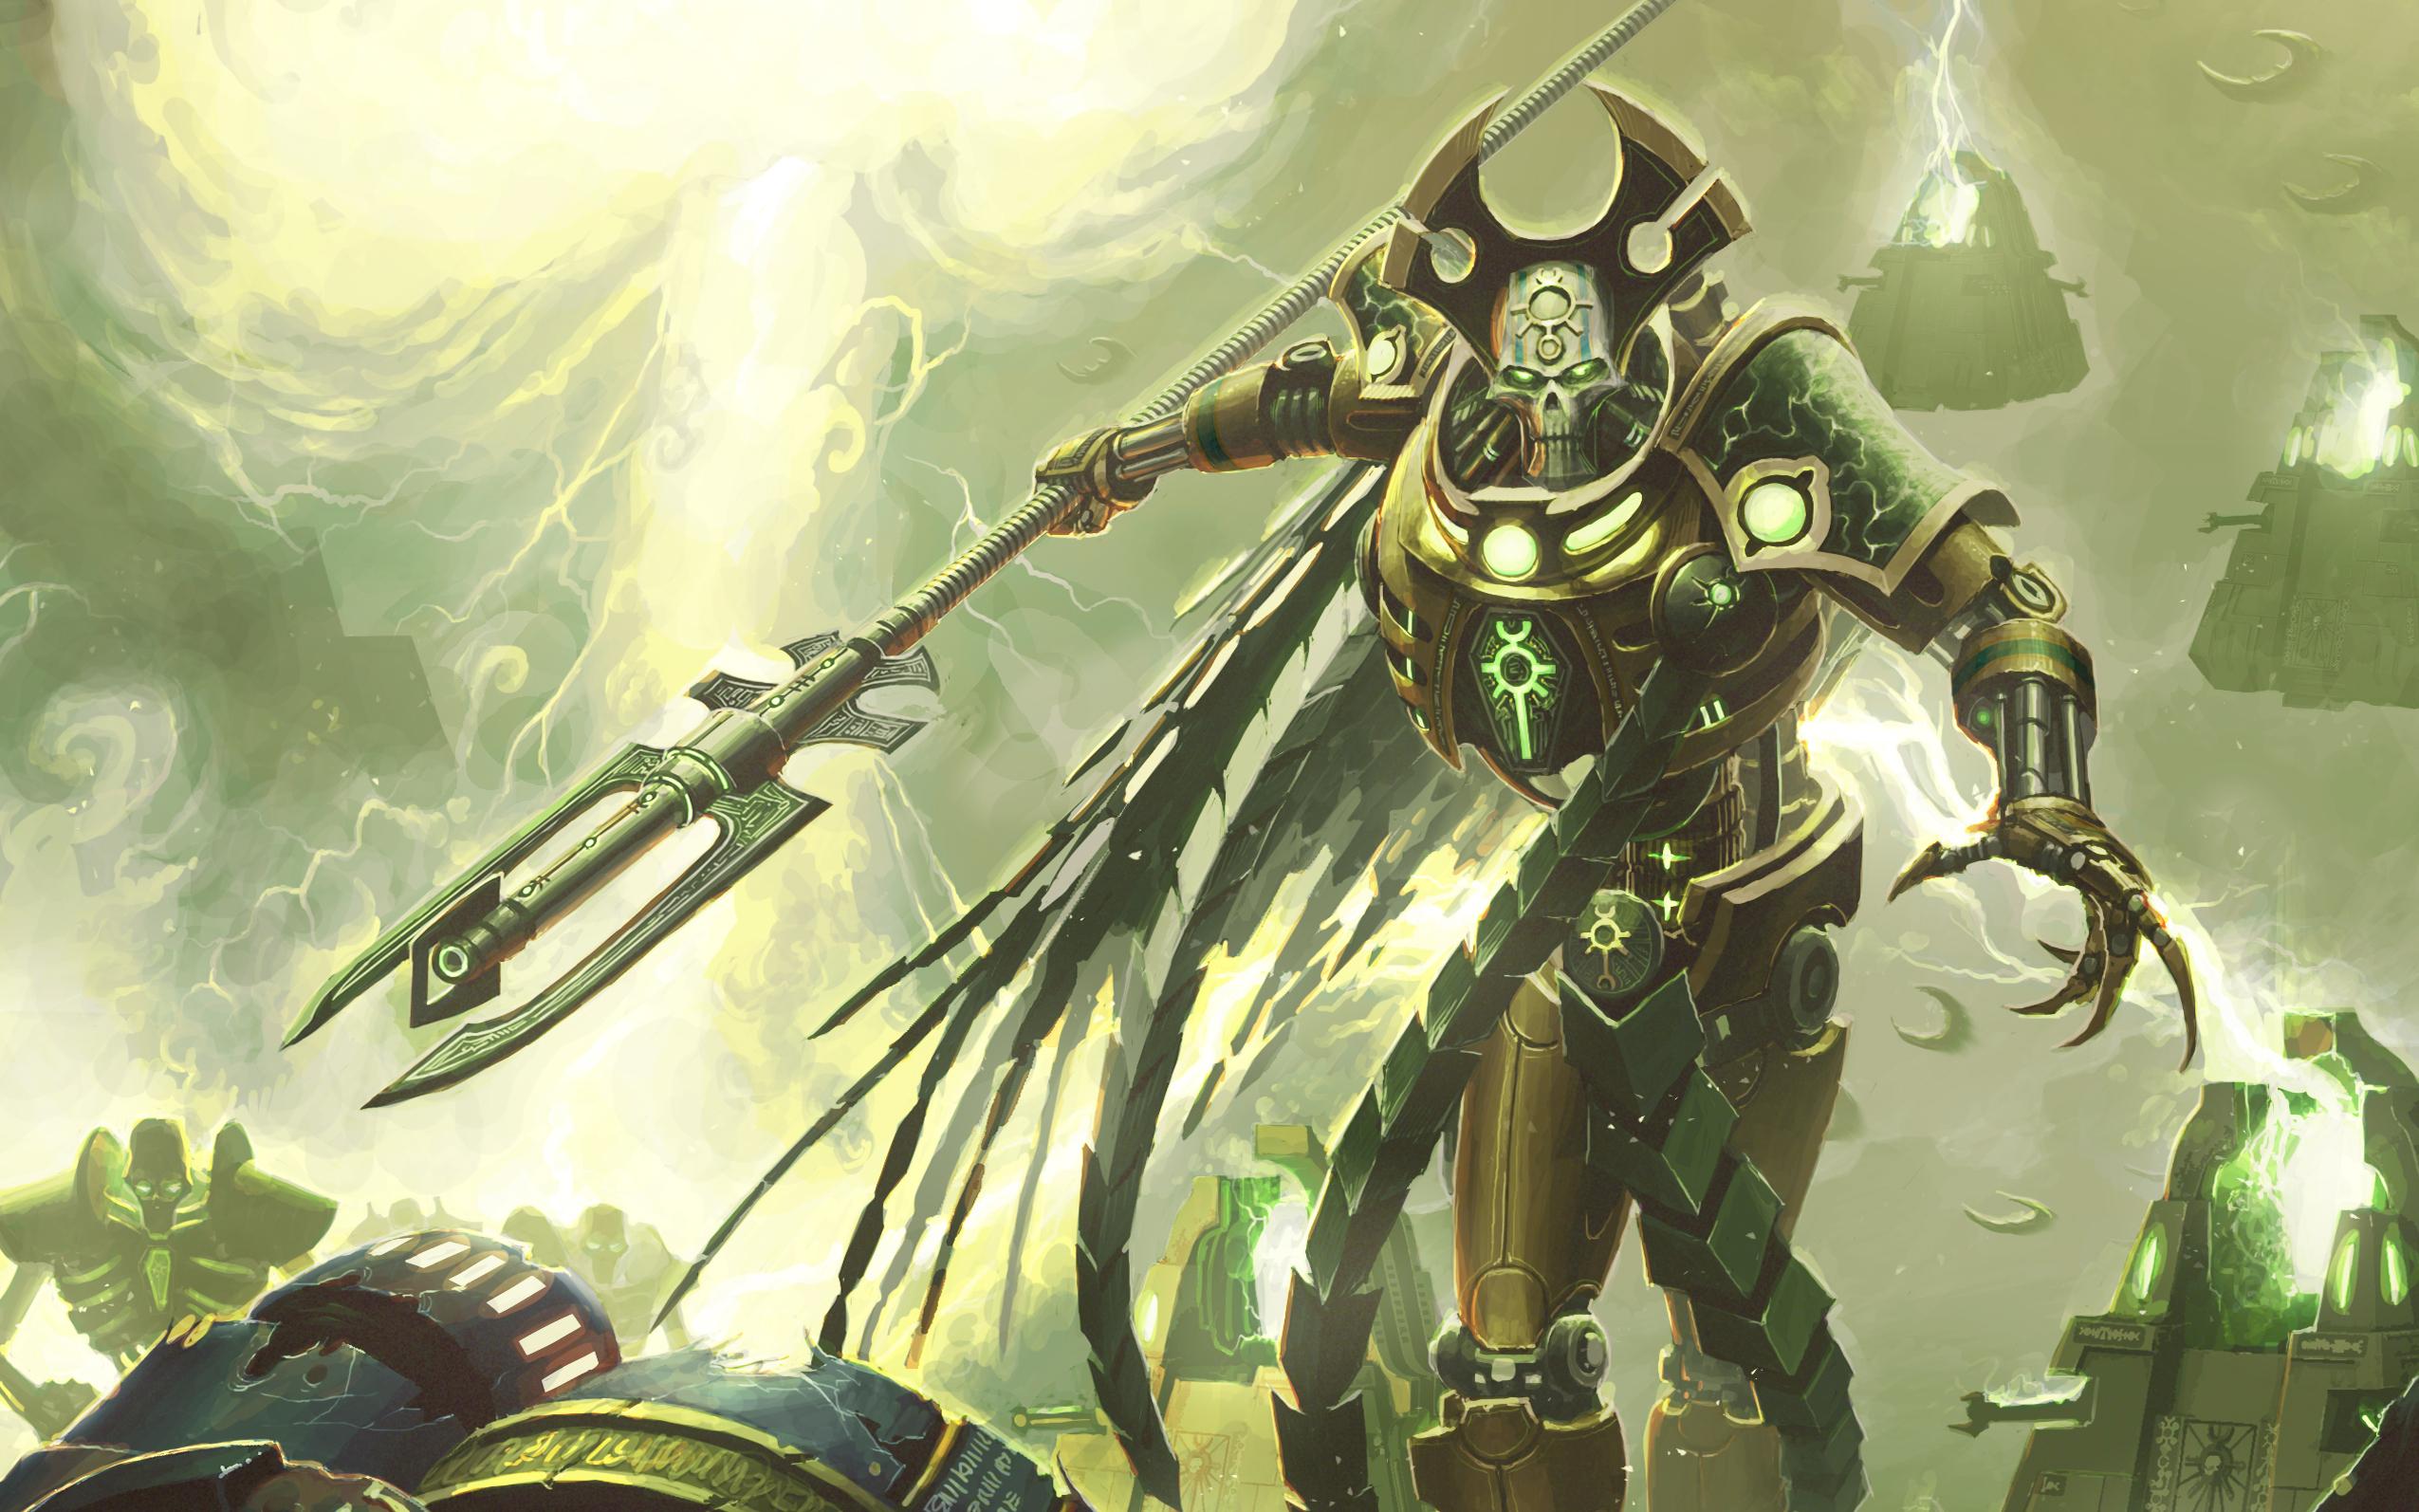 Warhammer Hd Wallpaper Background Image 2550x1594 Id 304620 Wallpaper Abyss